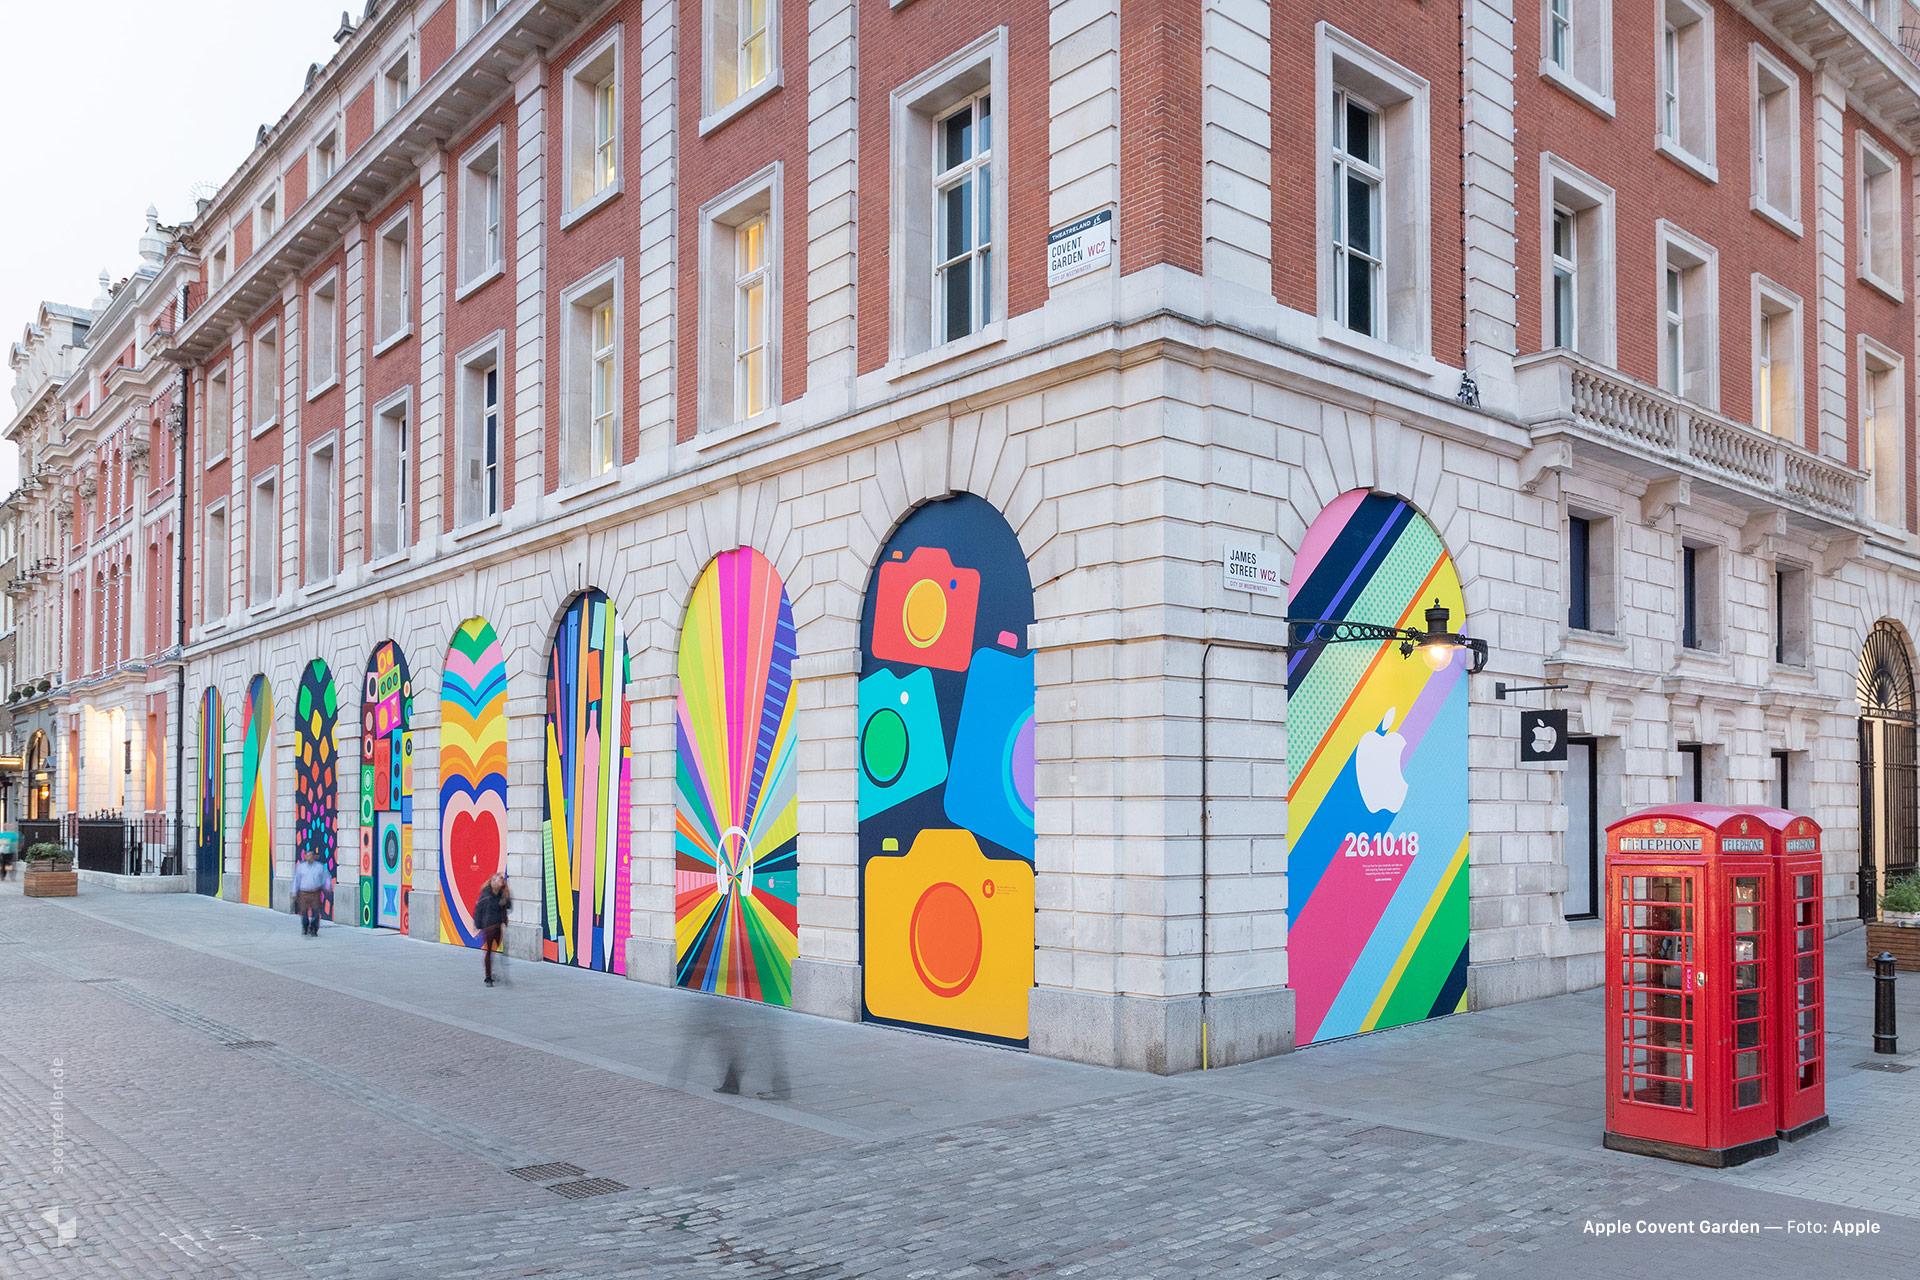 Parte externa da Apple Covent Garden